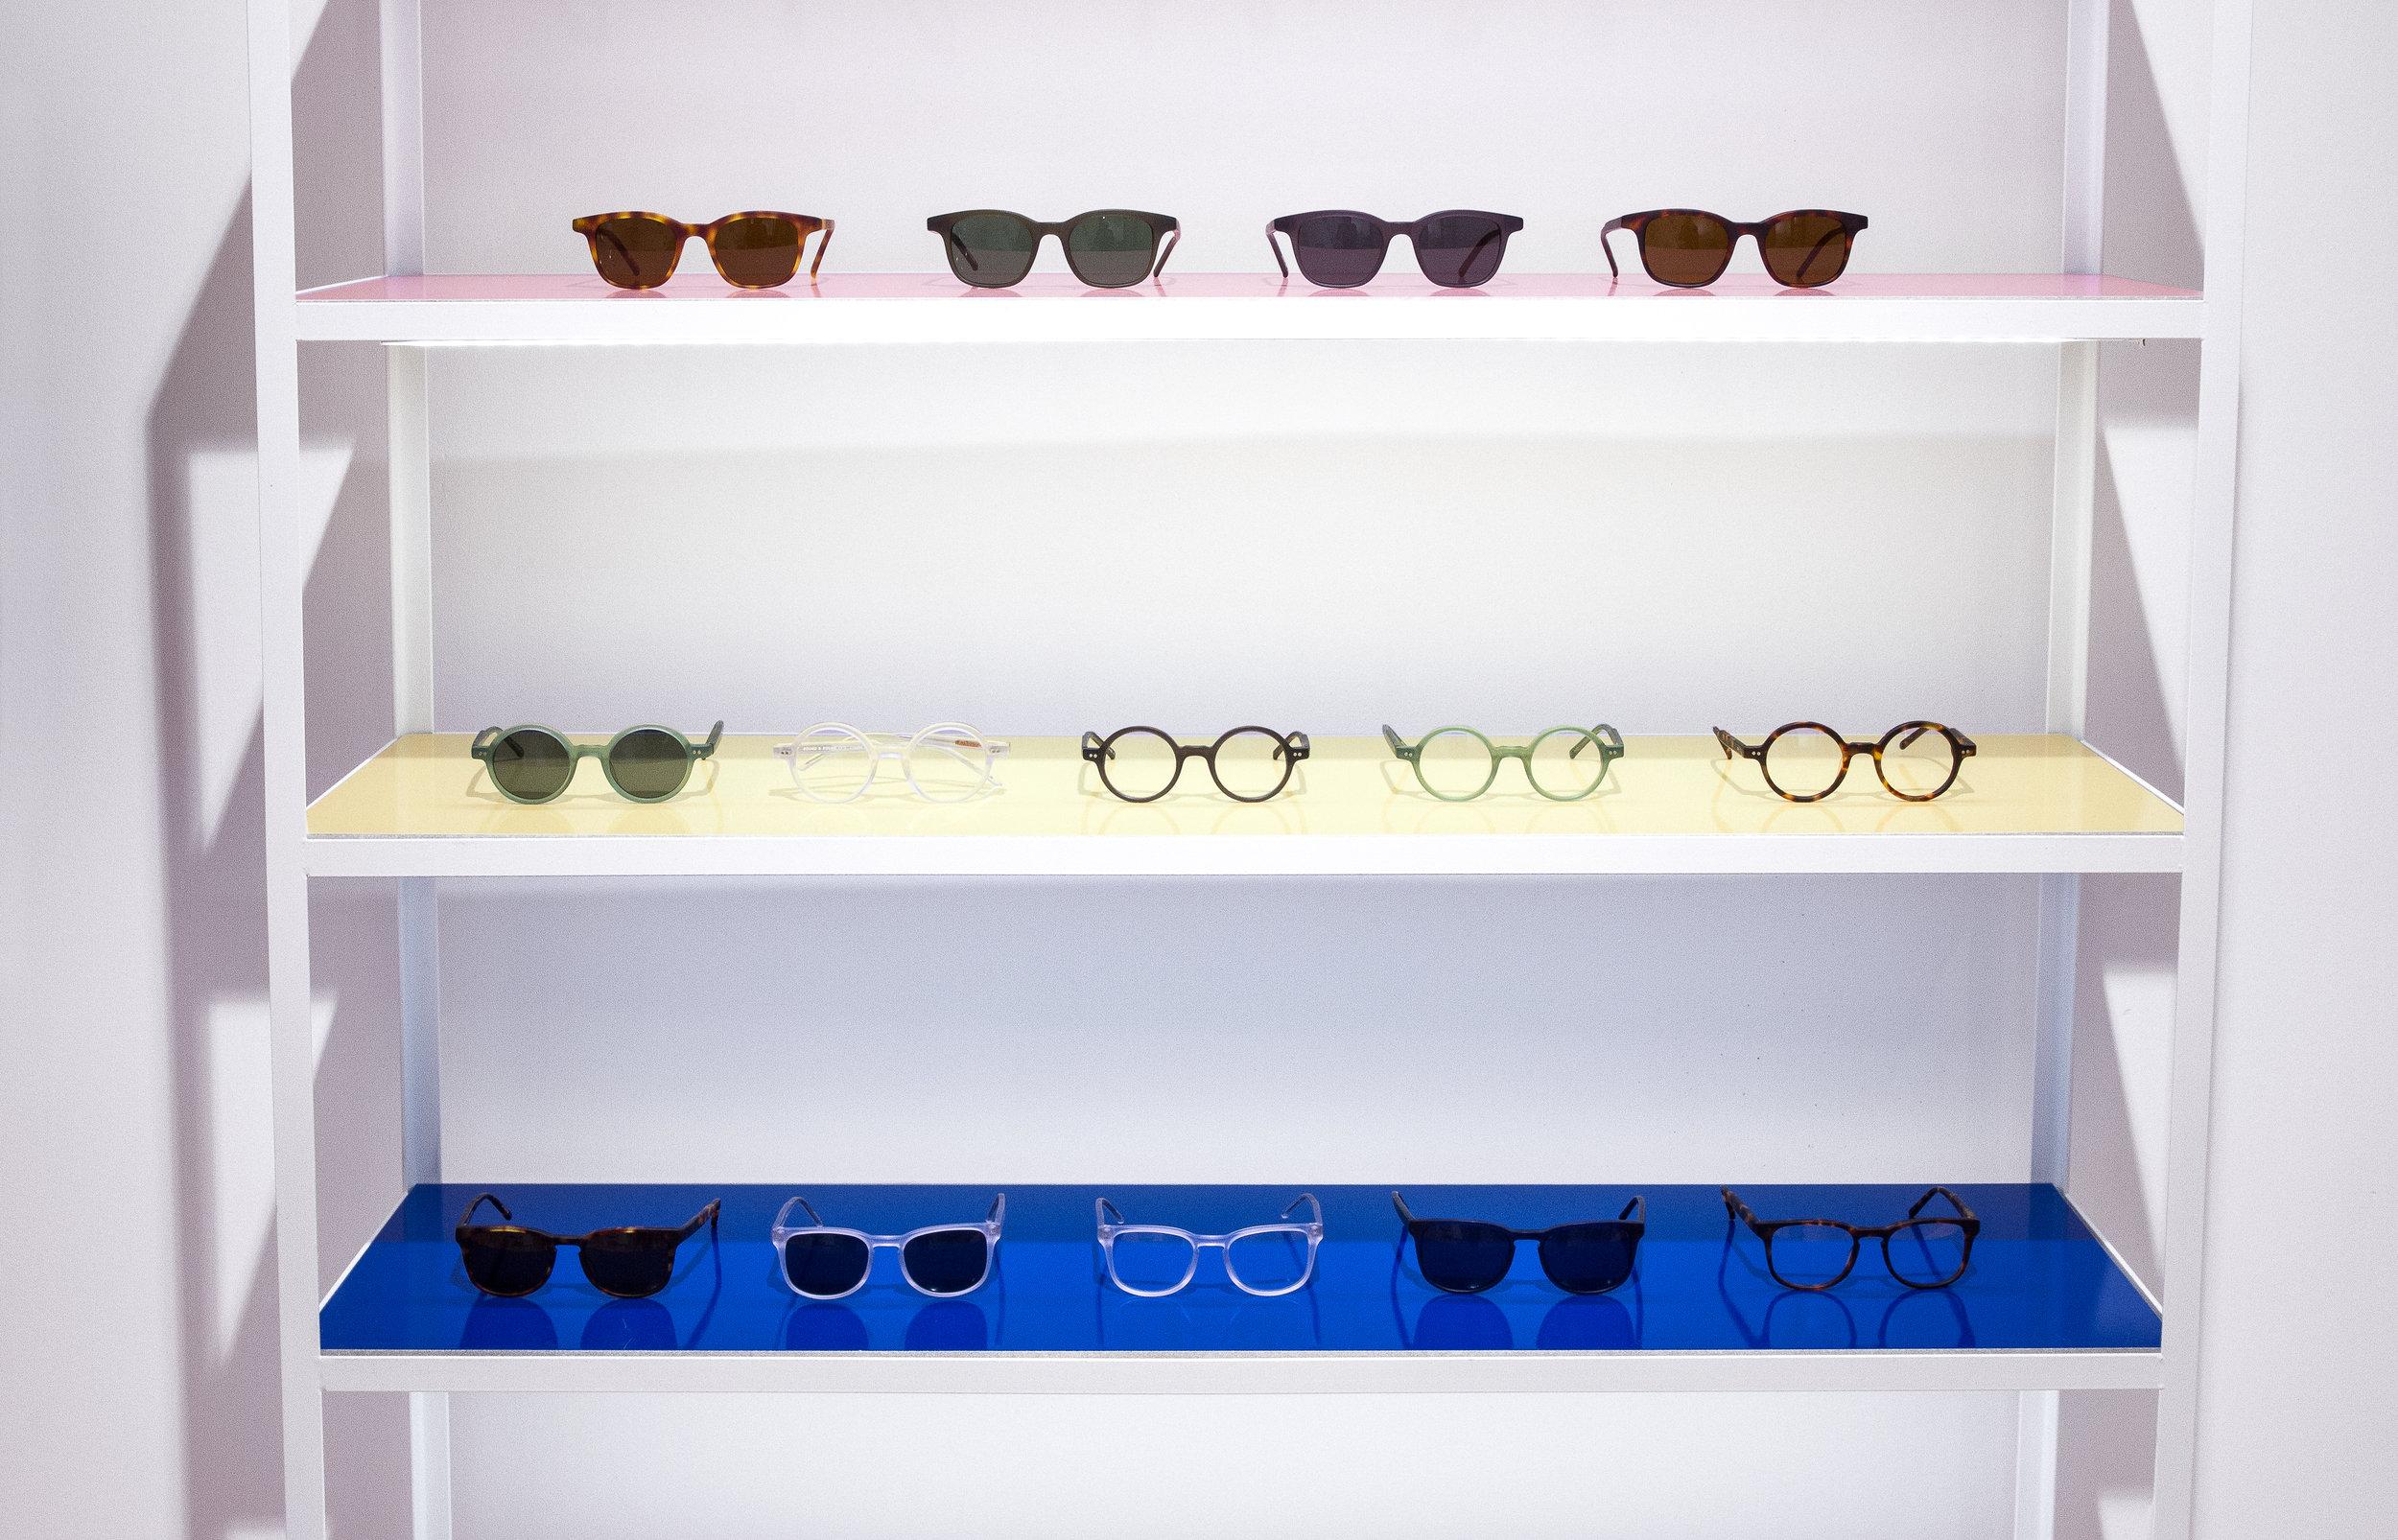 kaibosh_31_eyewear-shelfs.jpg